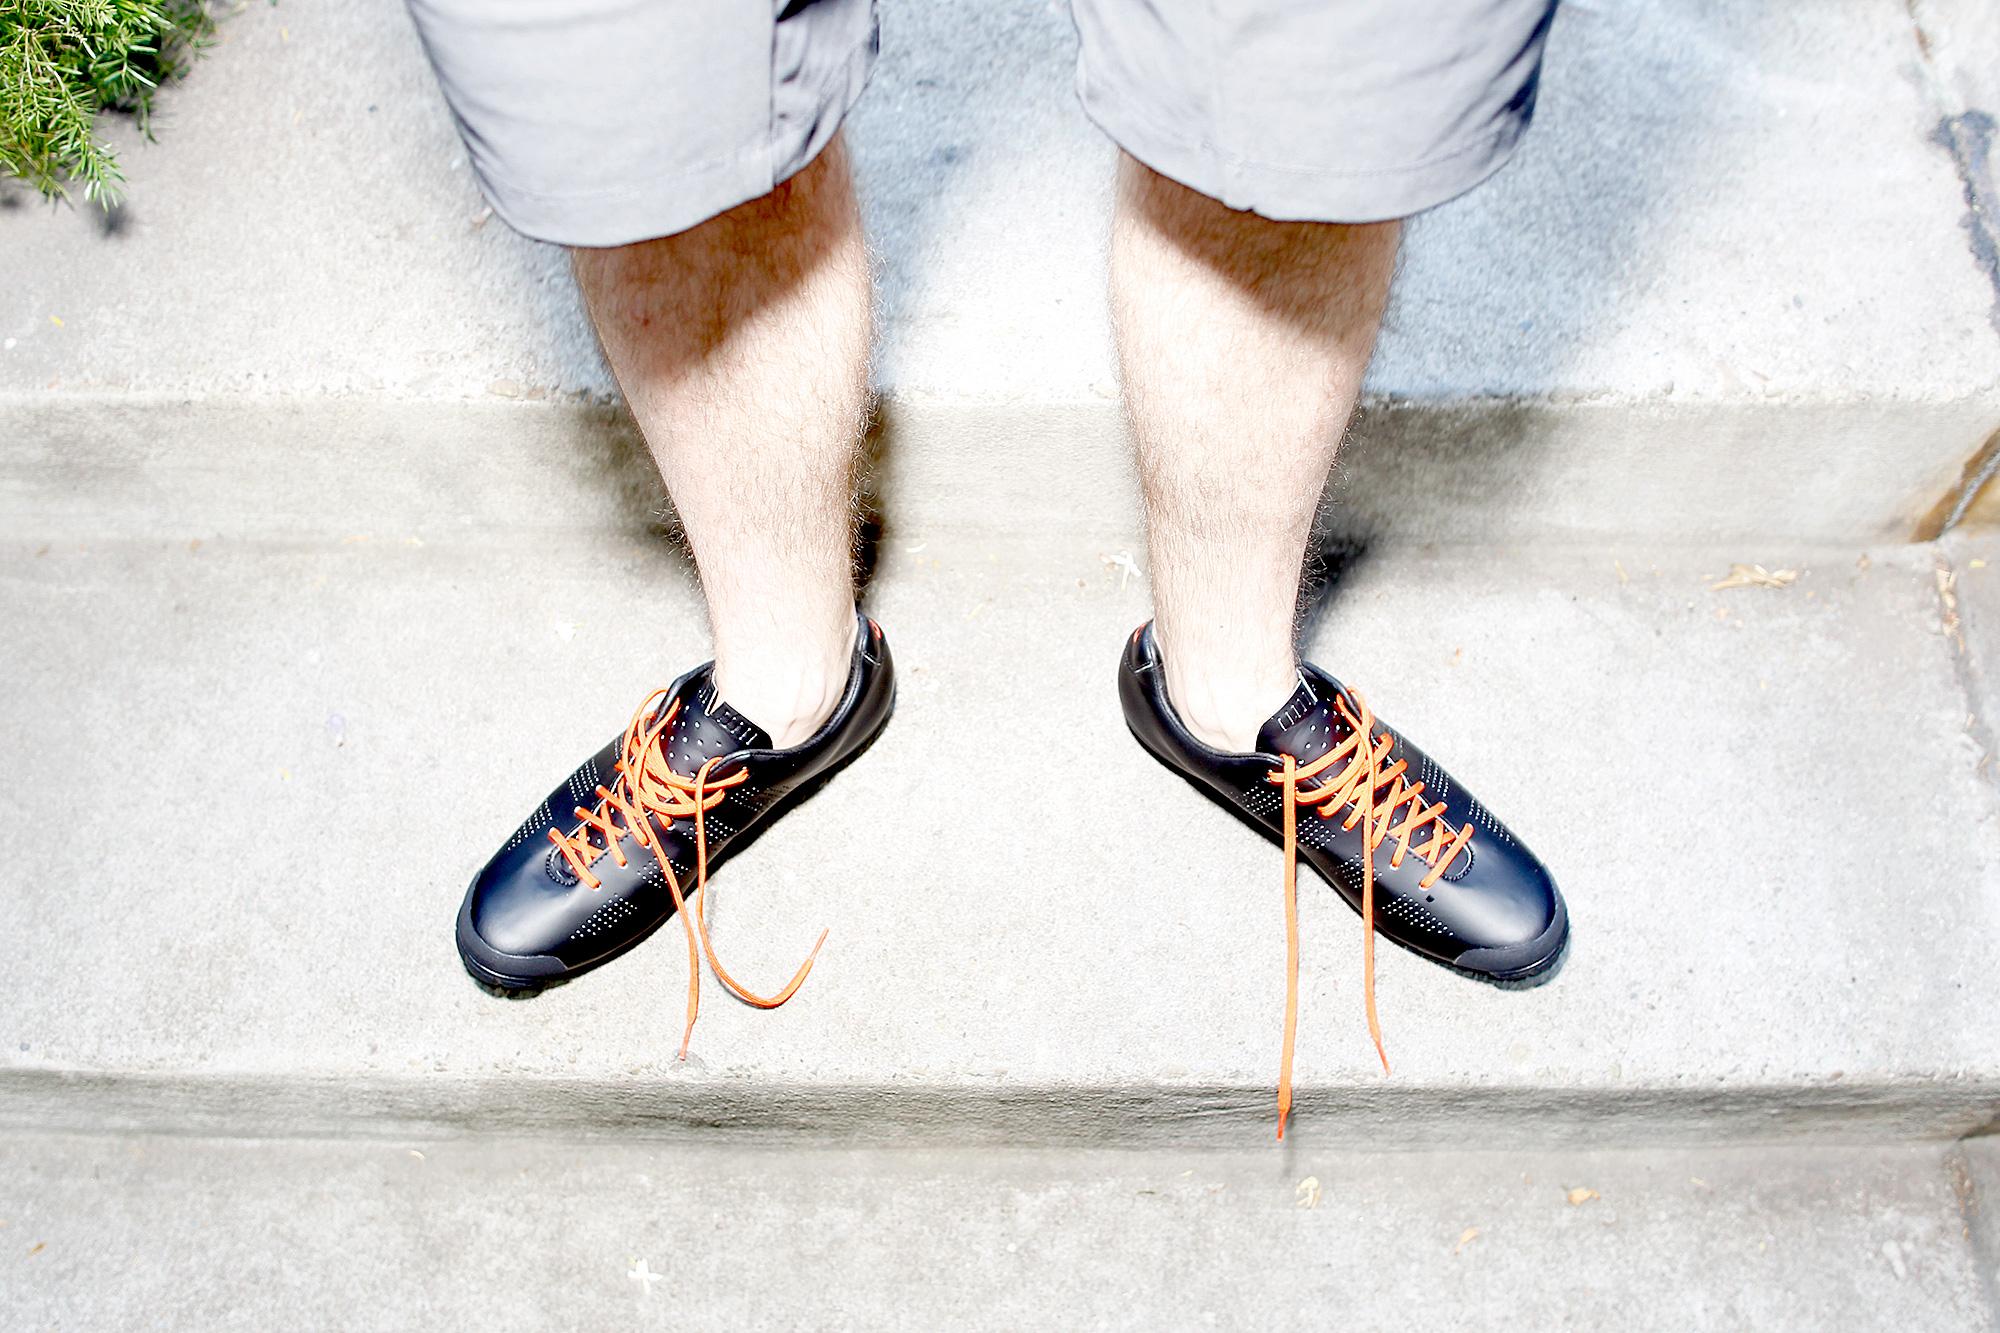 Giro Empire VR90 shoes. Photo: Jim Merithew/Element.ly